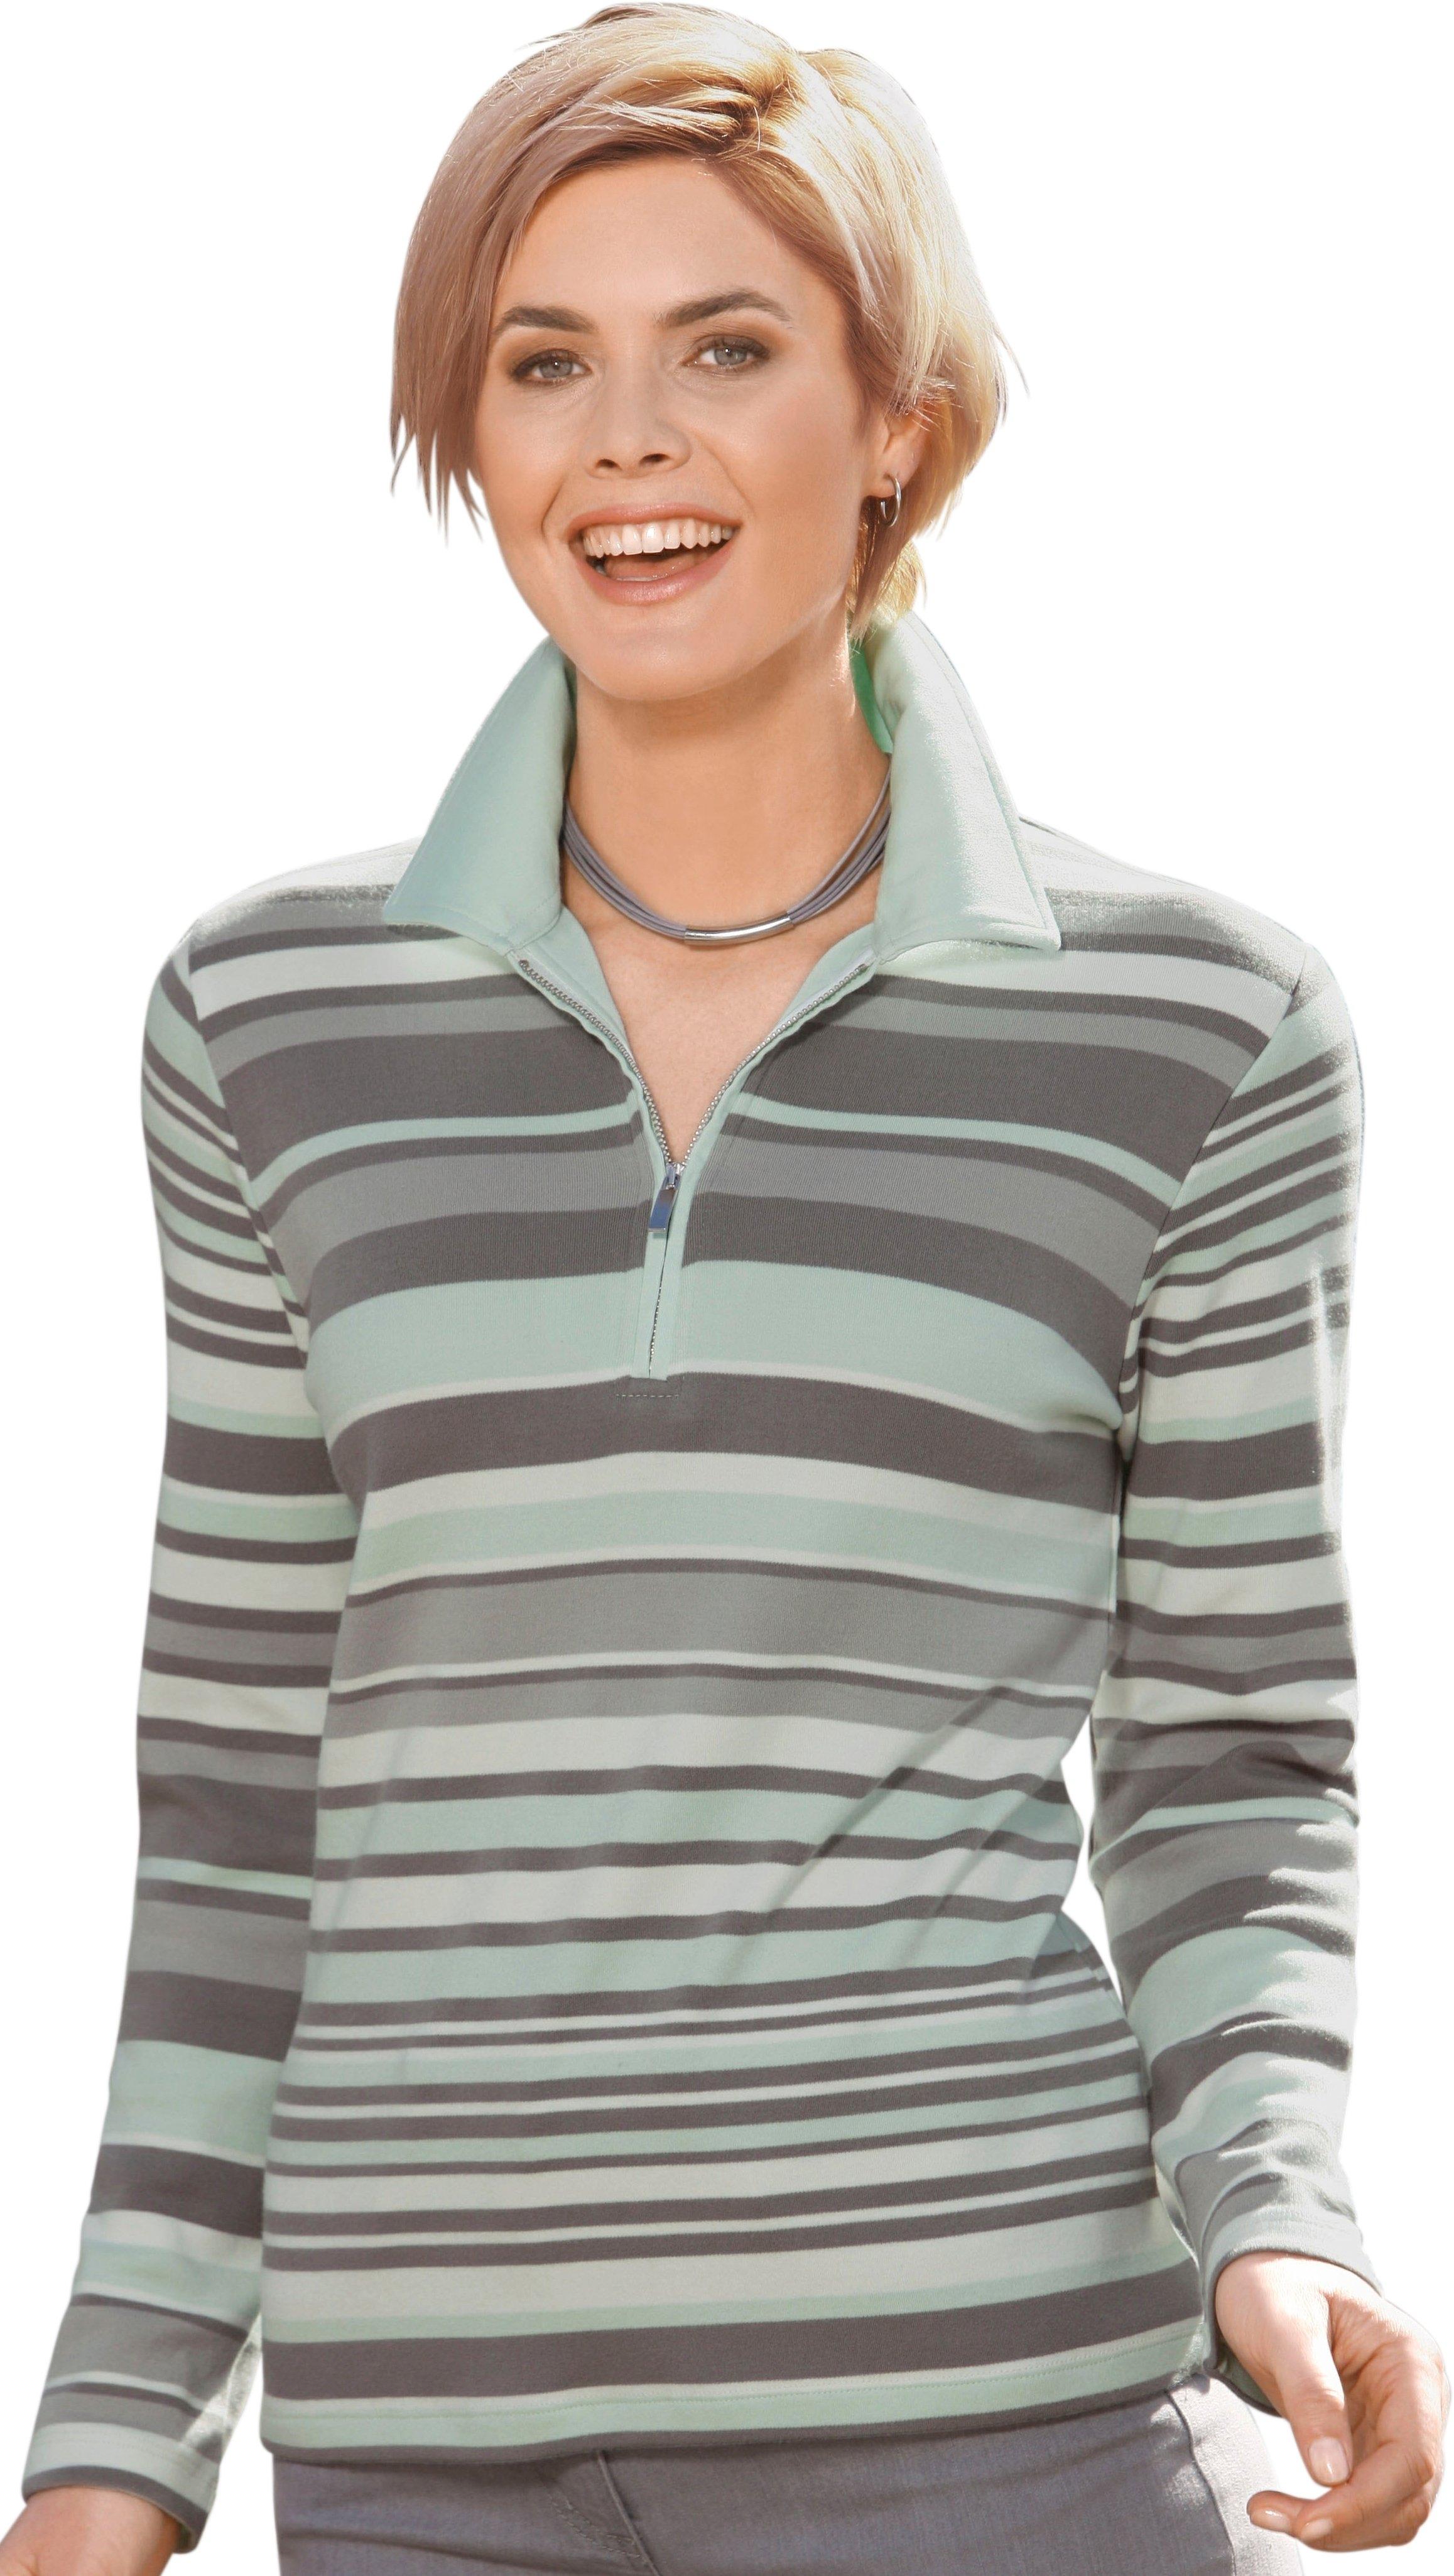 855cdf44568 Casual Looks shirt in PUREWEAR-kwaliteit